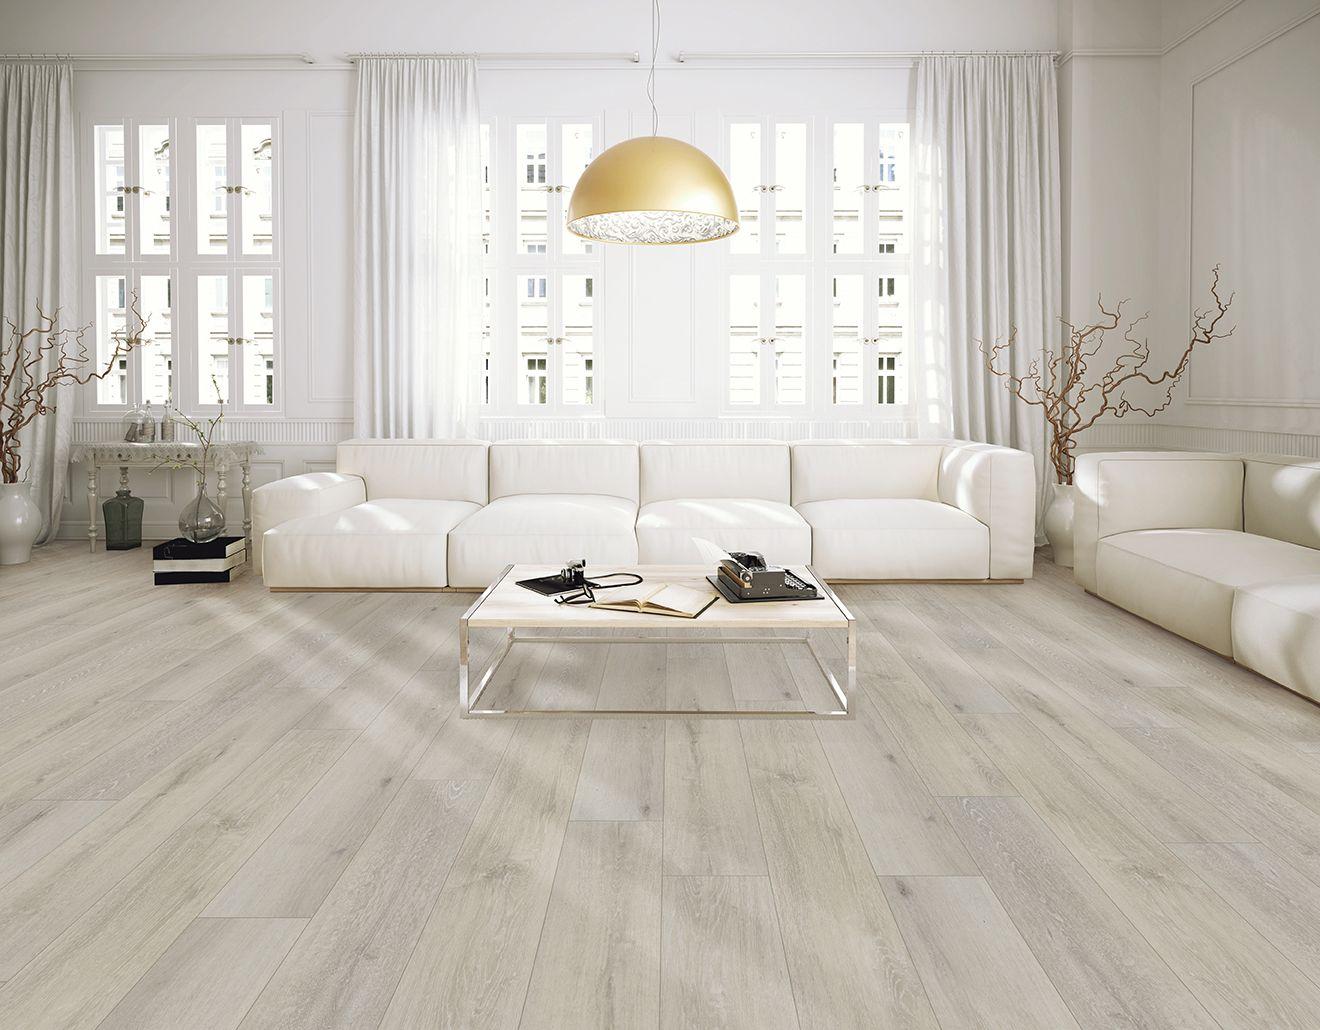 Gorgeous Light Gray Hardwood Floors Coretec Flooring Vinyl Plank Flooring Vinyl Wood Flooring